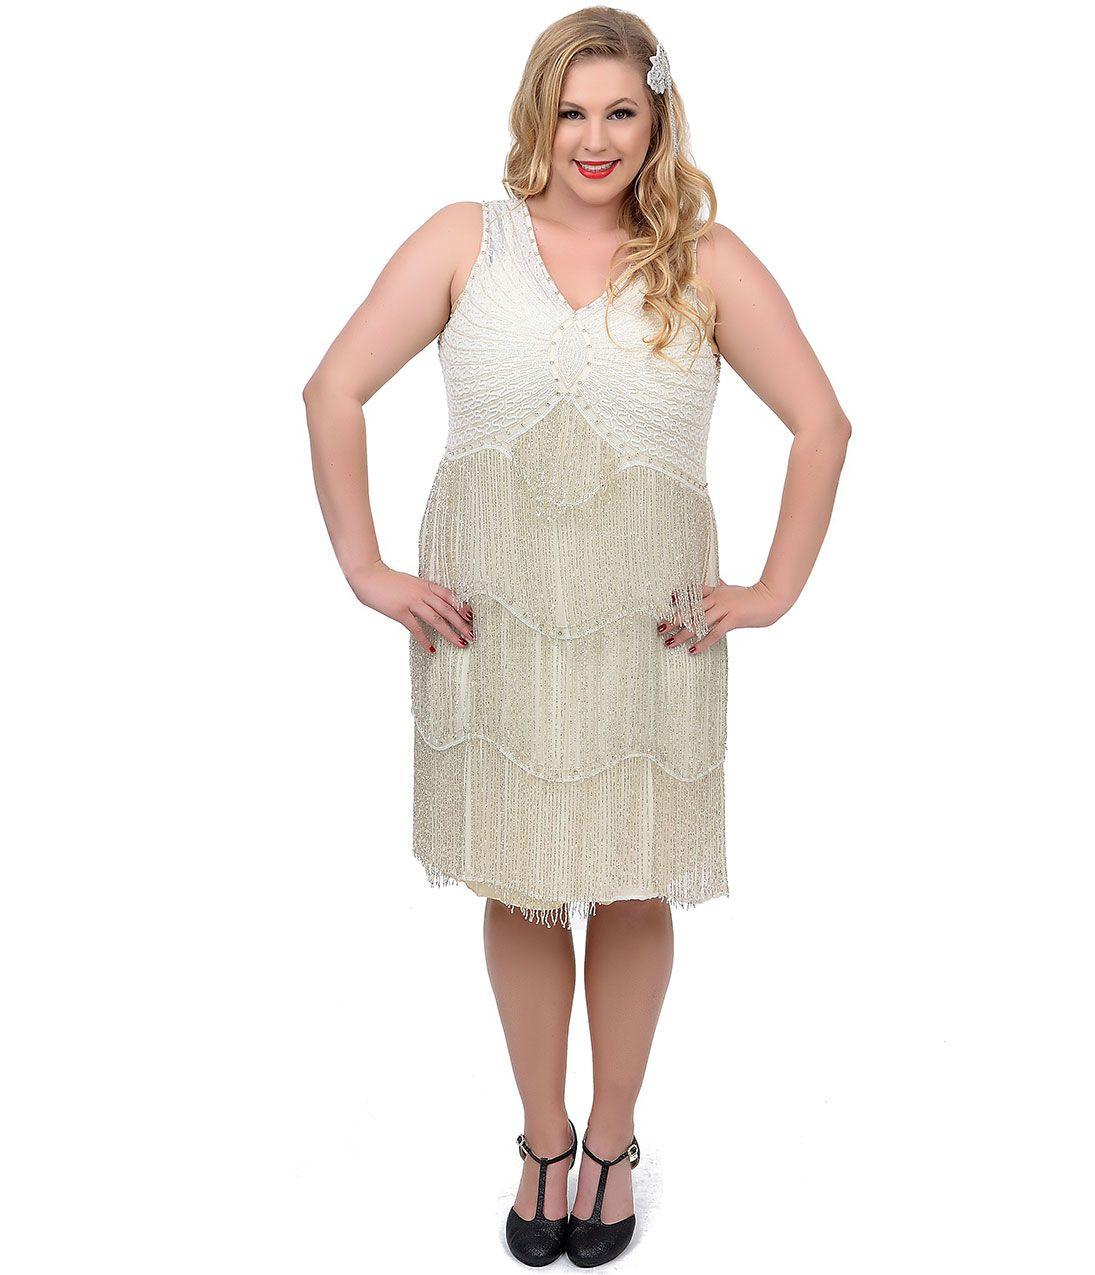 Shop 1920s Plus Size Dresses and Costumes | 1920s Dresses ...